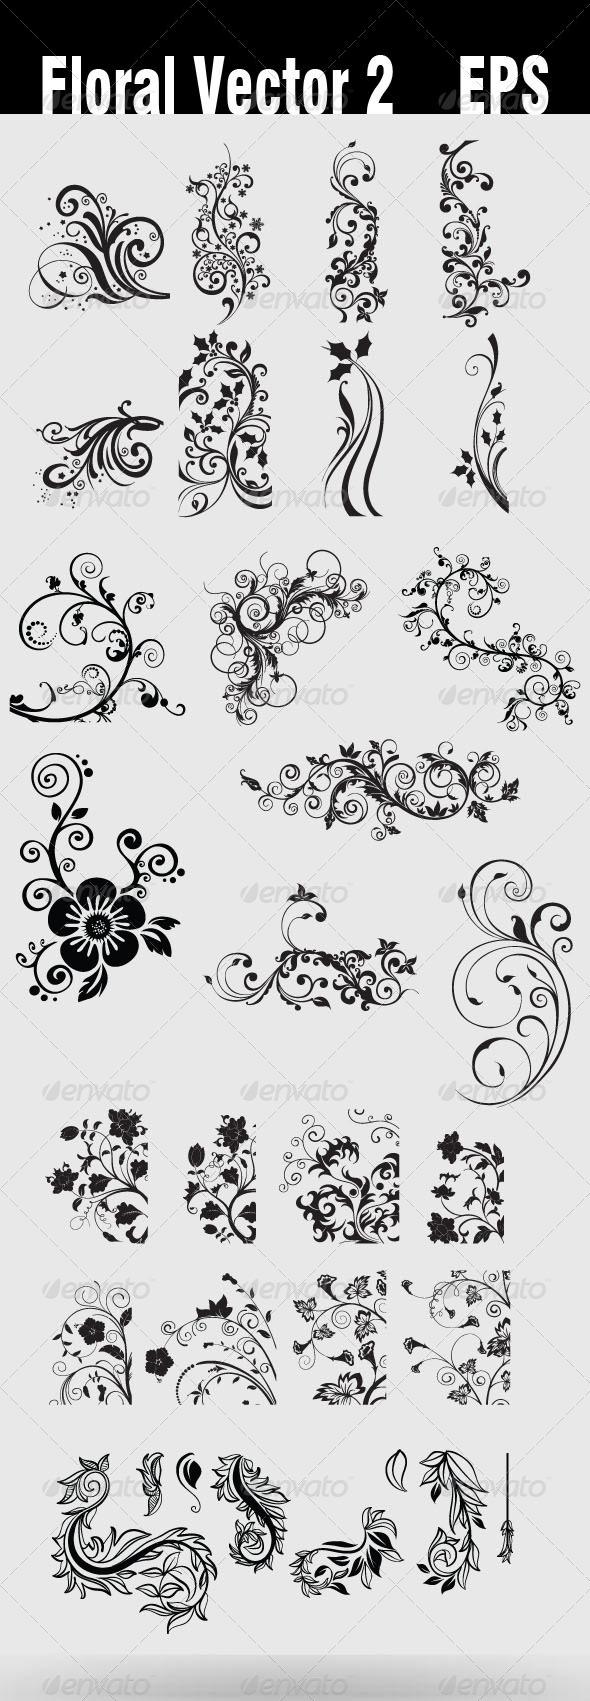 Floral Vector 2 EPS - Flourishes / Swirls Decorative